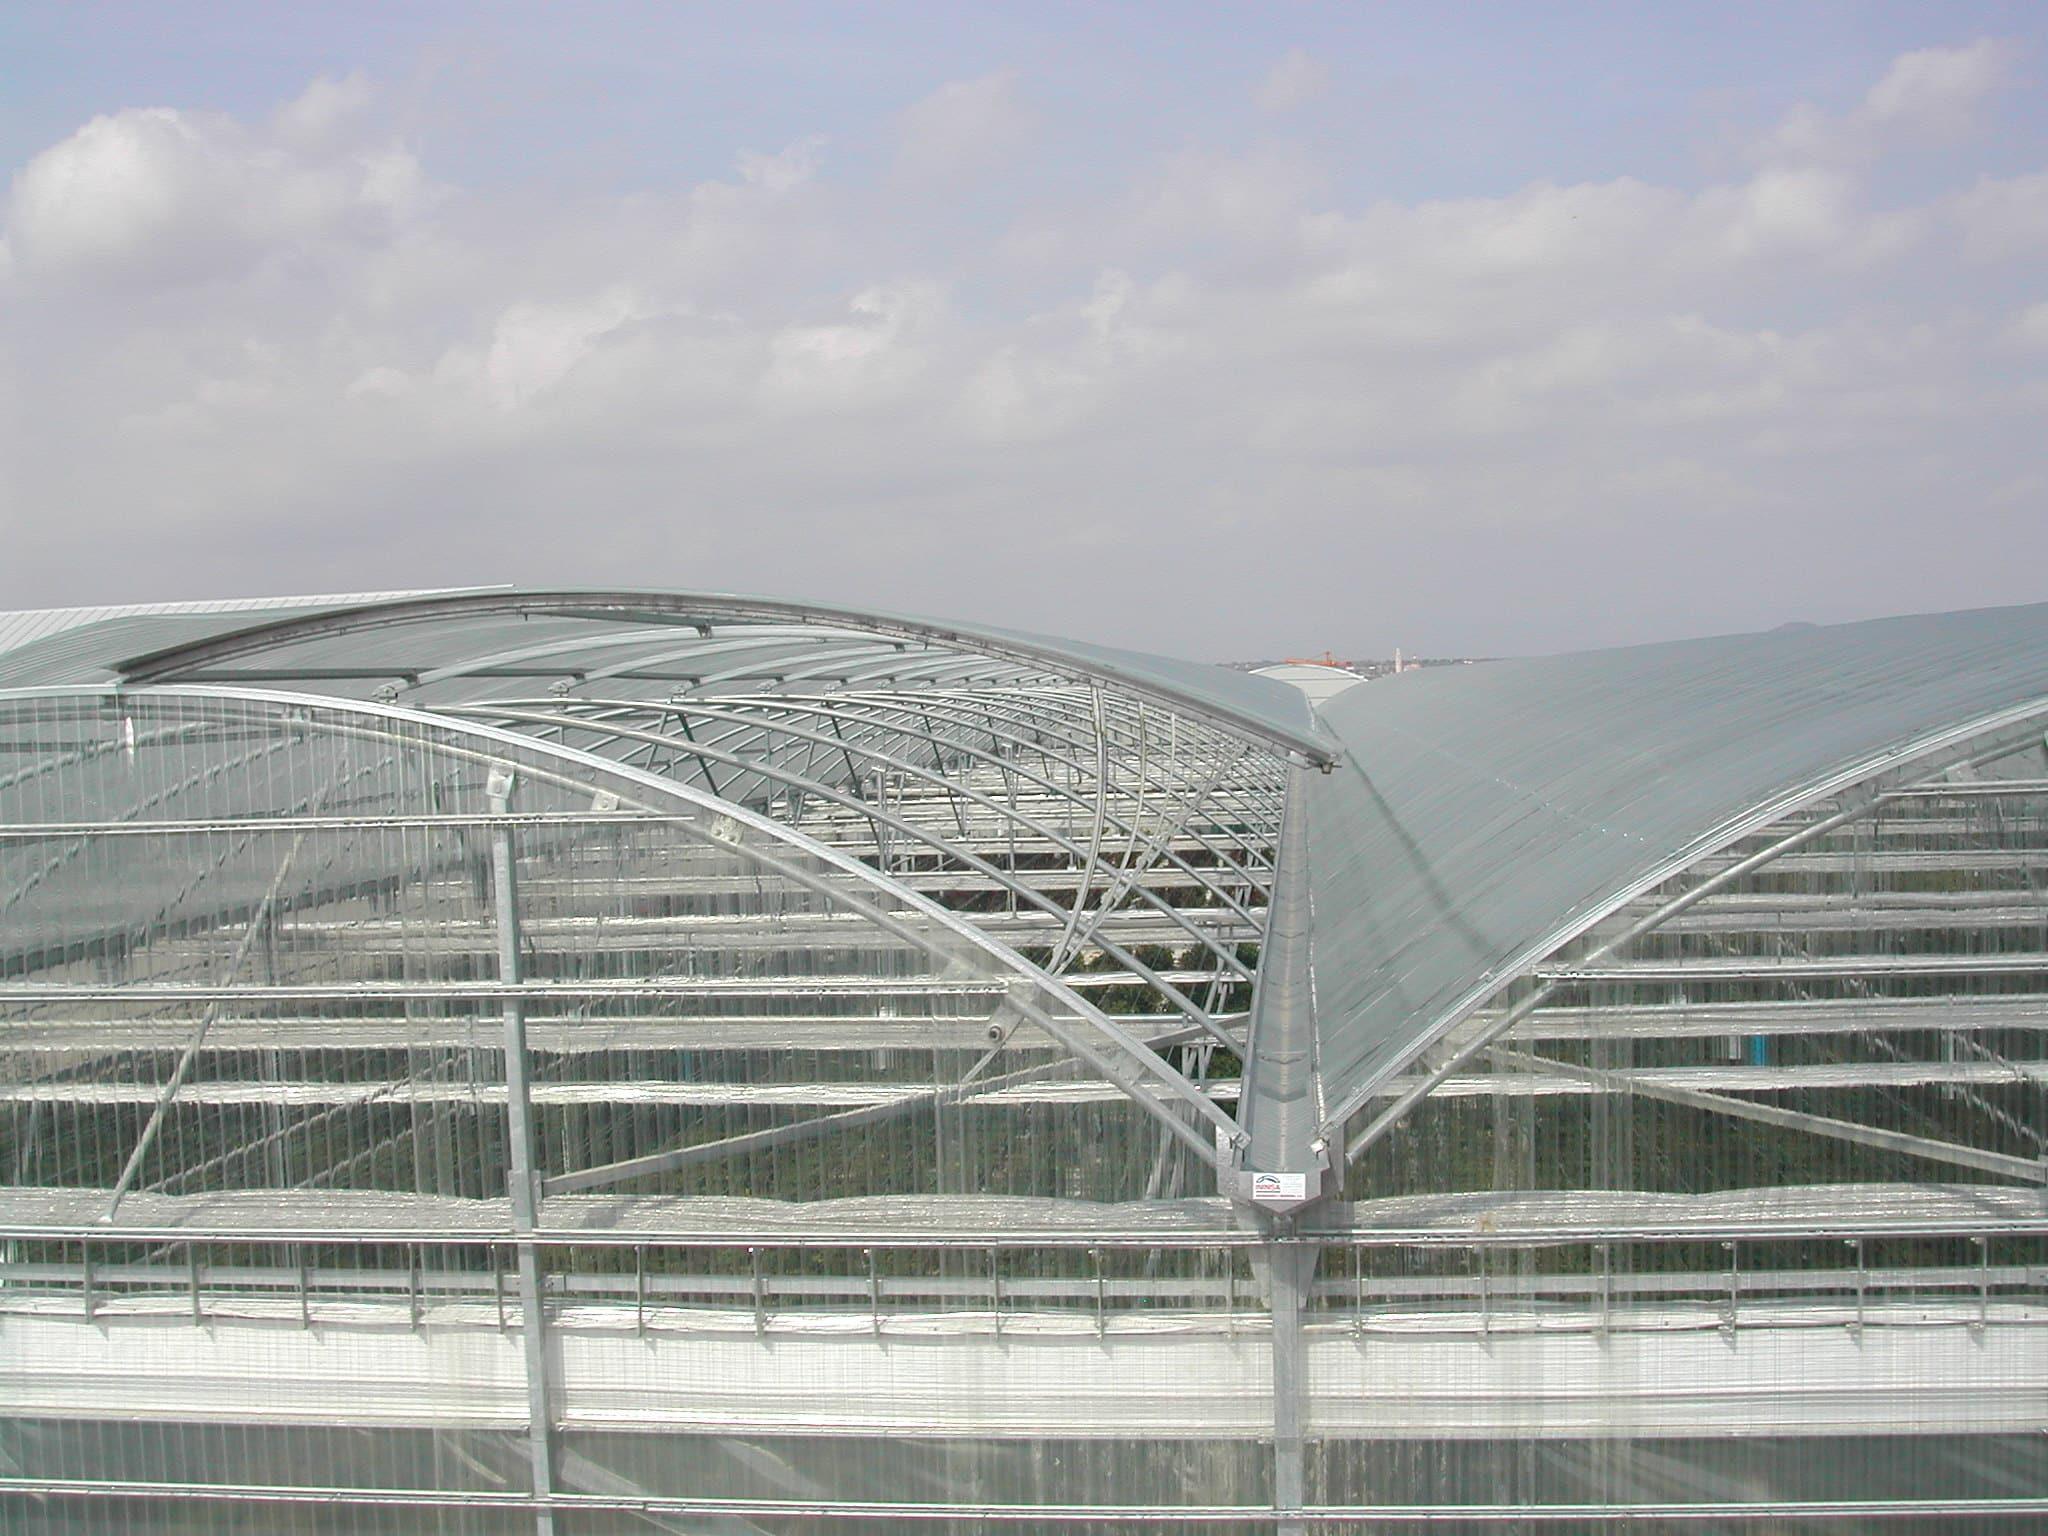 Rosales Ferrer instalaciones